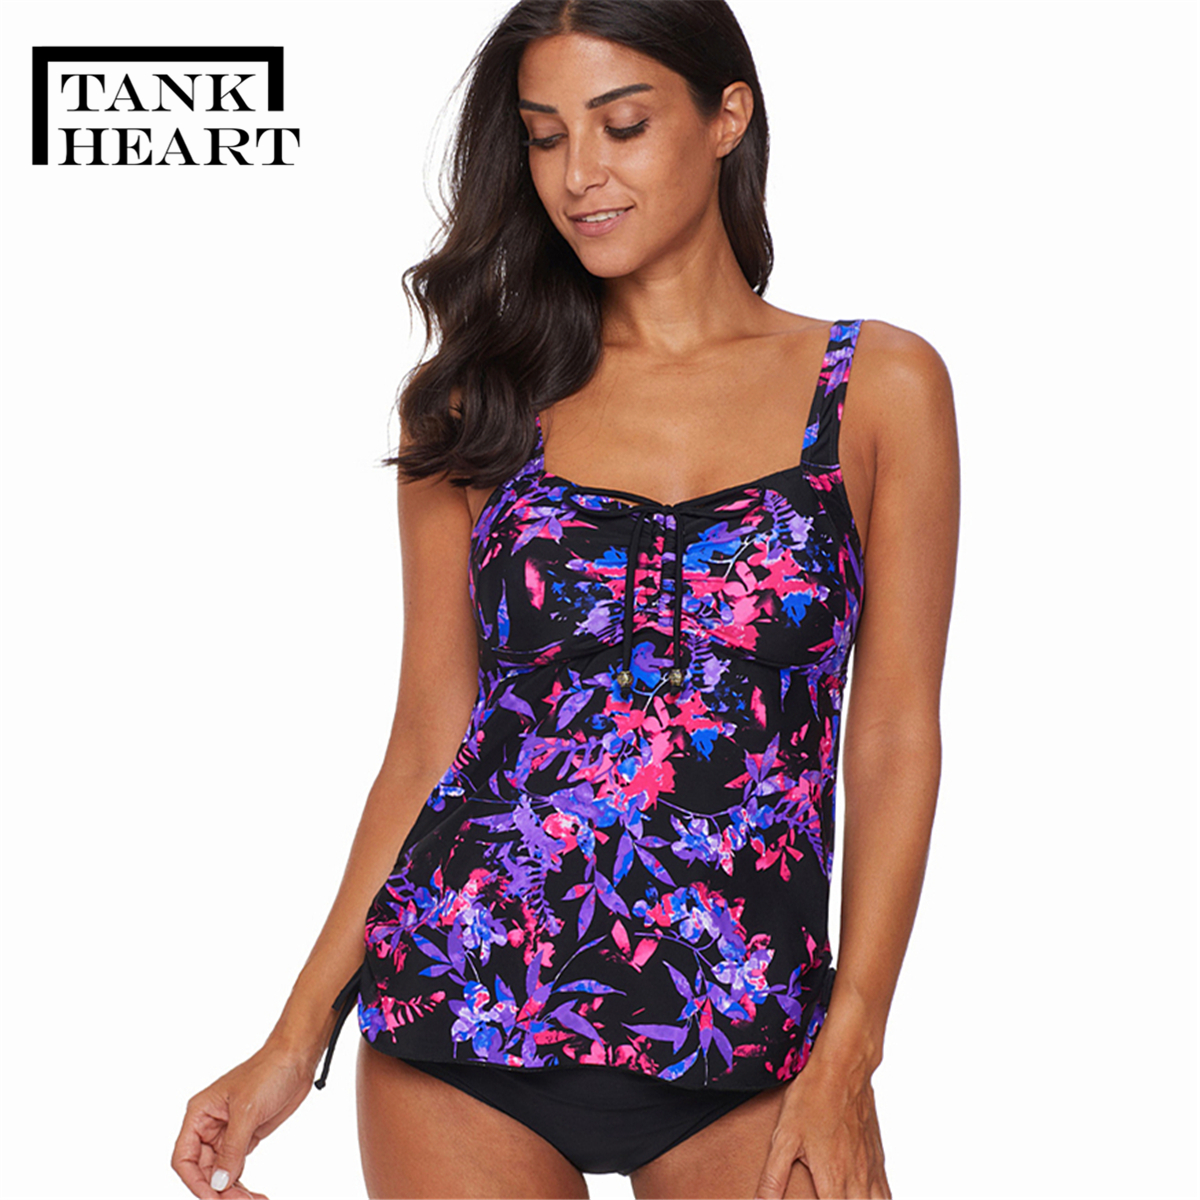 Print Swimming Suit For Women's Two Piece Bikini Plus Size Swimwear Tankini Swimsuits Women Ff Swim Suit Printed Two Piece Skirt